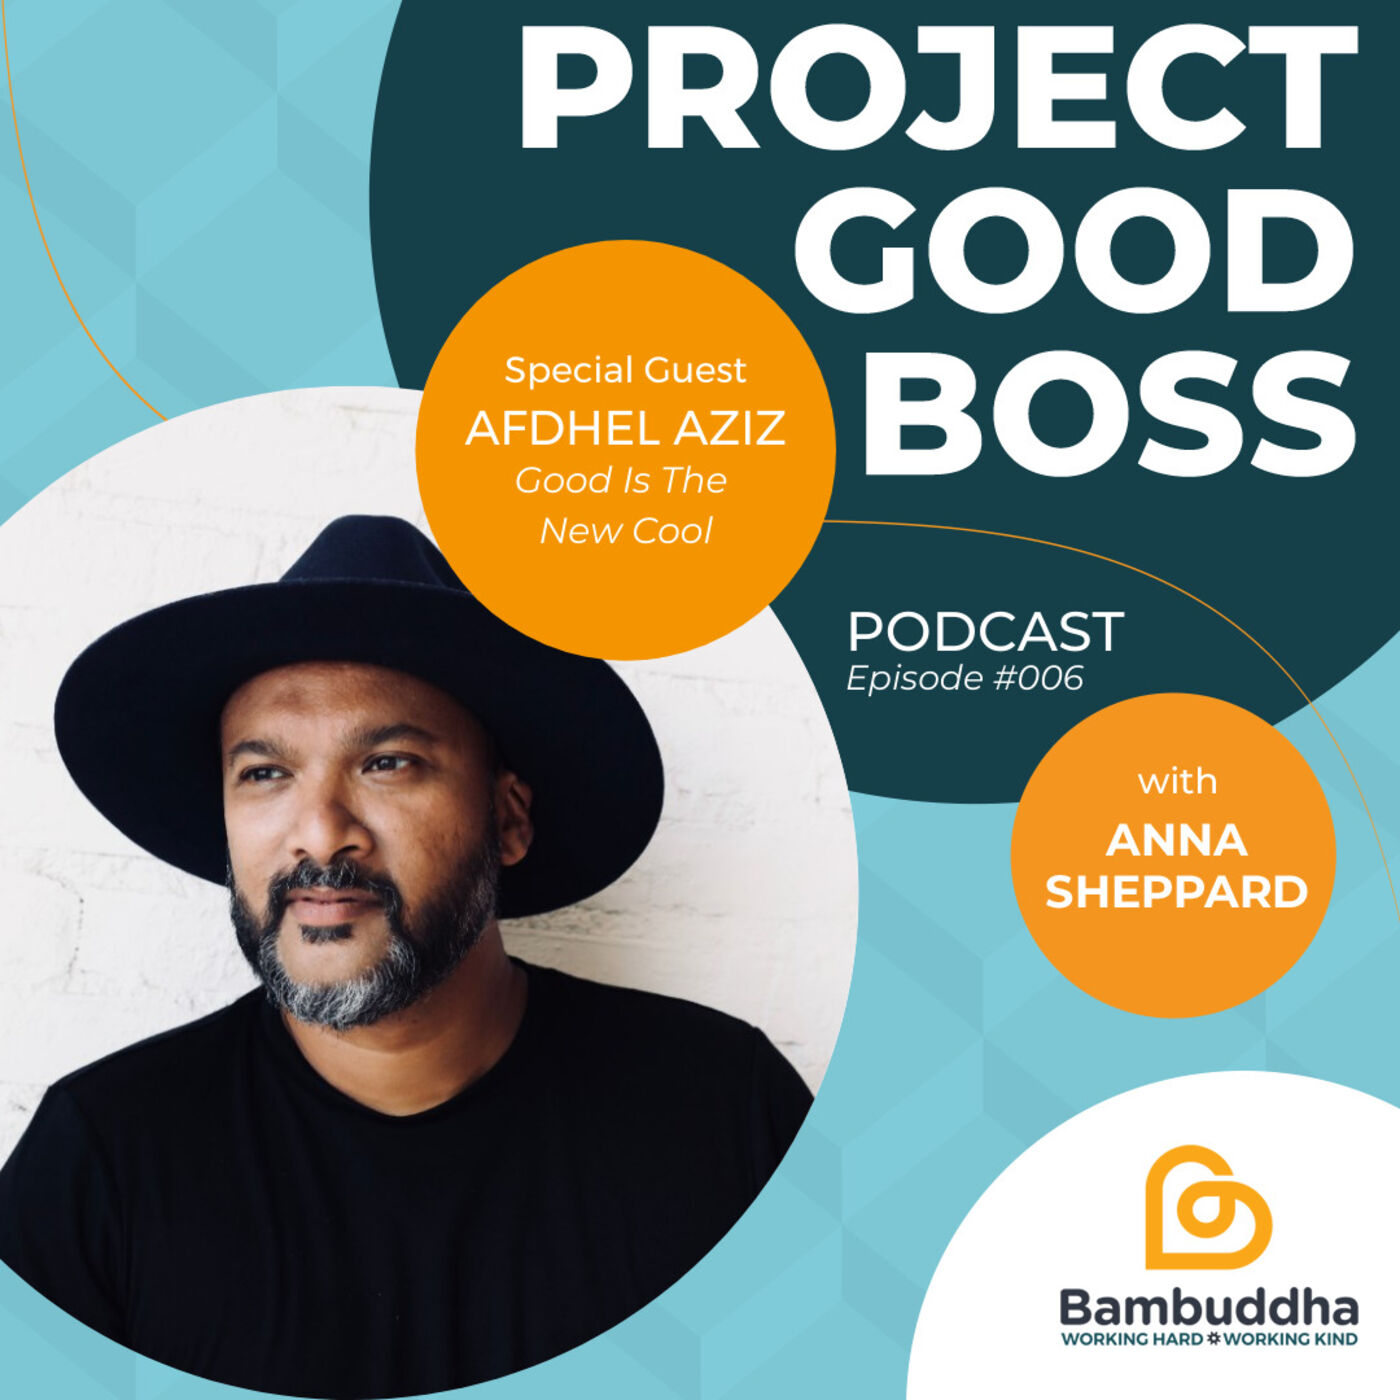 Afdhel Aziz on Finding Purpose